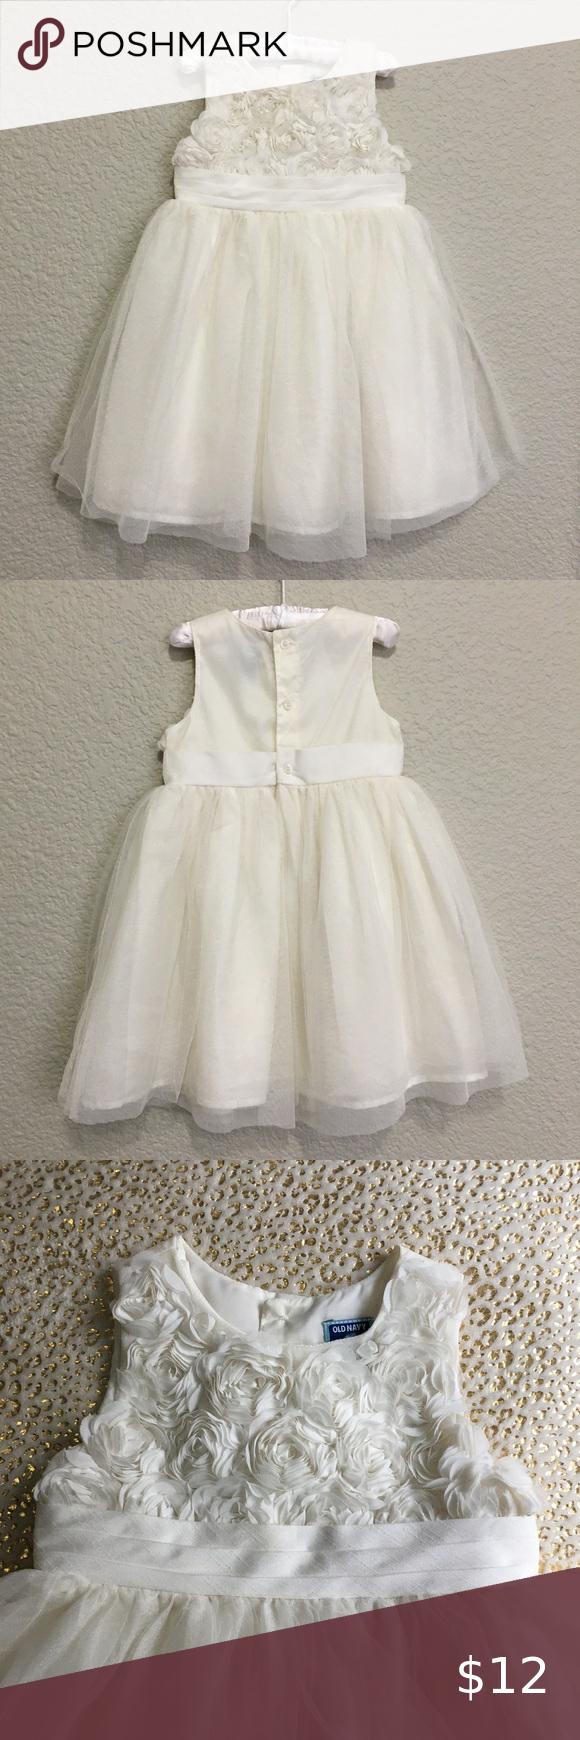 Old Navy White Rose Party Dress 3t 3t Dress Party Dress Dresses [ 1740 x 580 Pixel ]